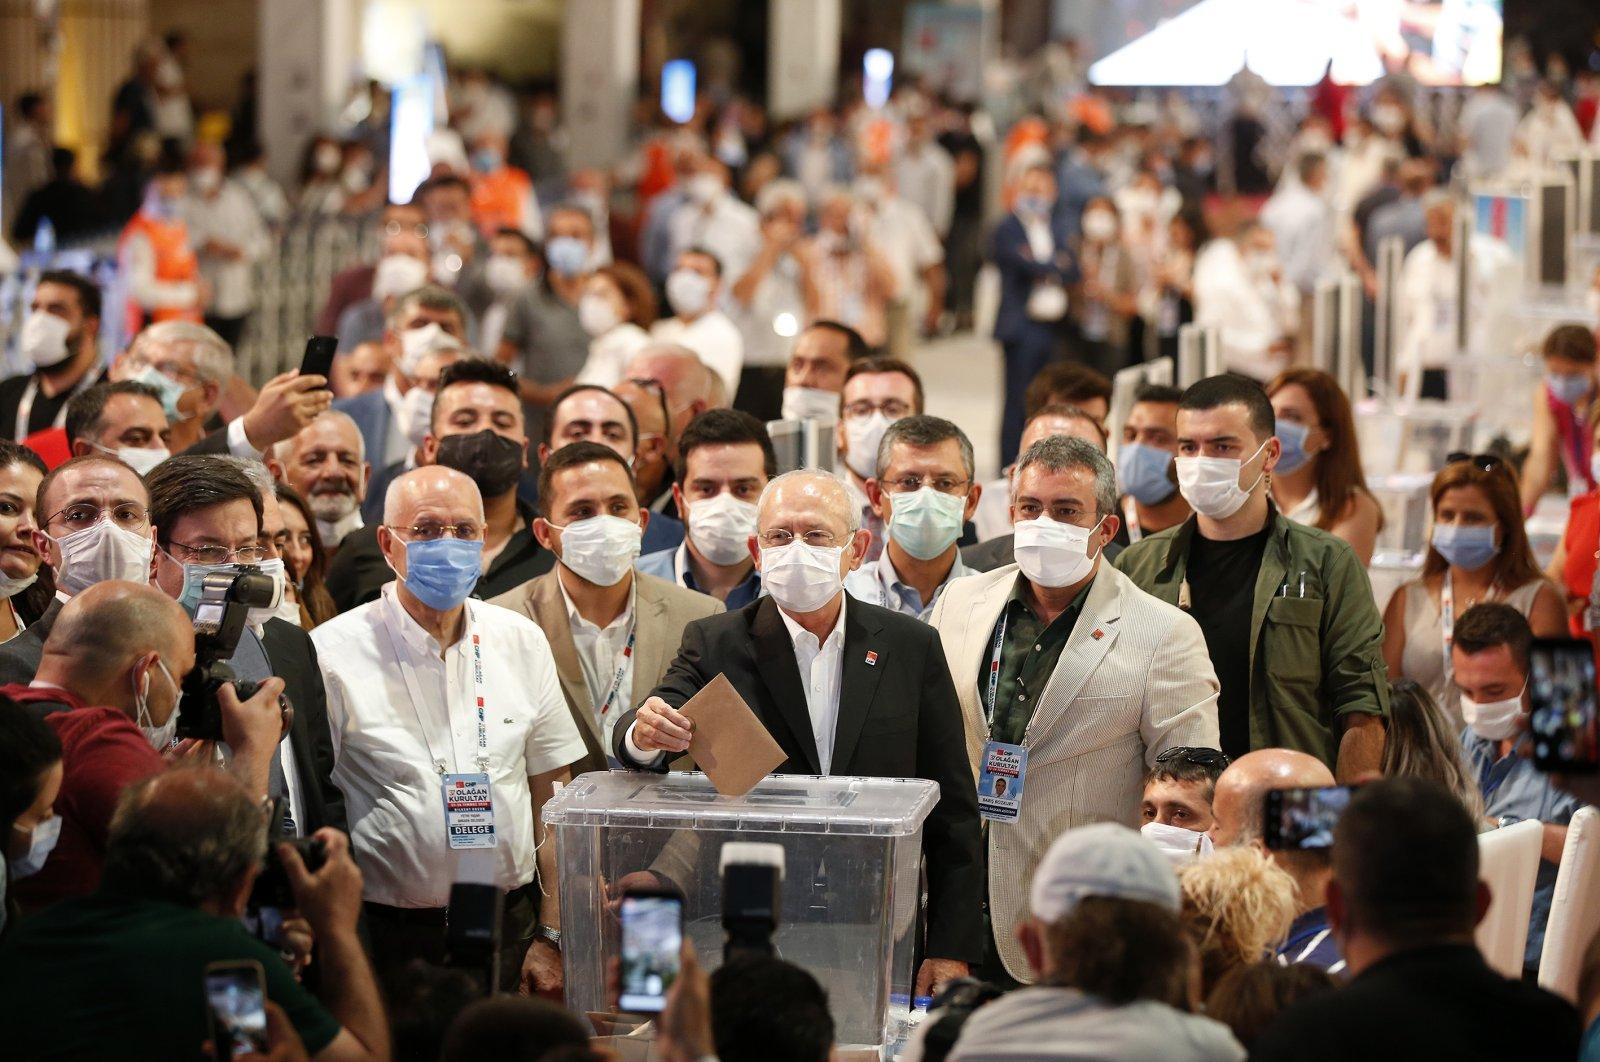 Republican People's Party (CHP) Chairman Kemal Kılıçdaroğlu casts his vote at his party's 37th general congress at Bilkent Odeon in Ankara, Turkey, July 25, 2020. (AA Photo)